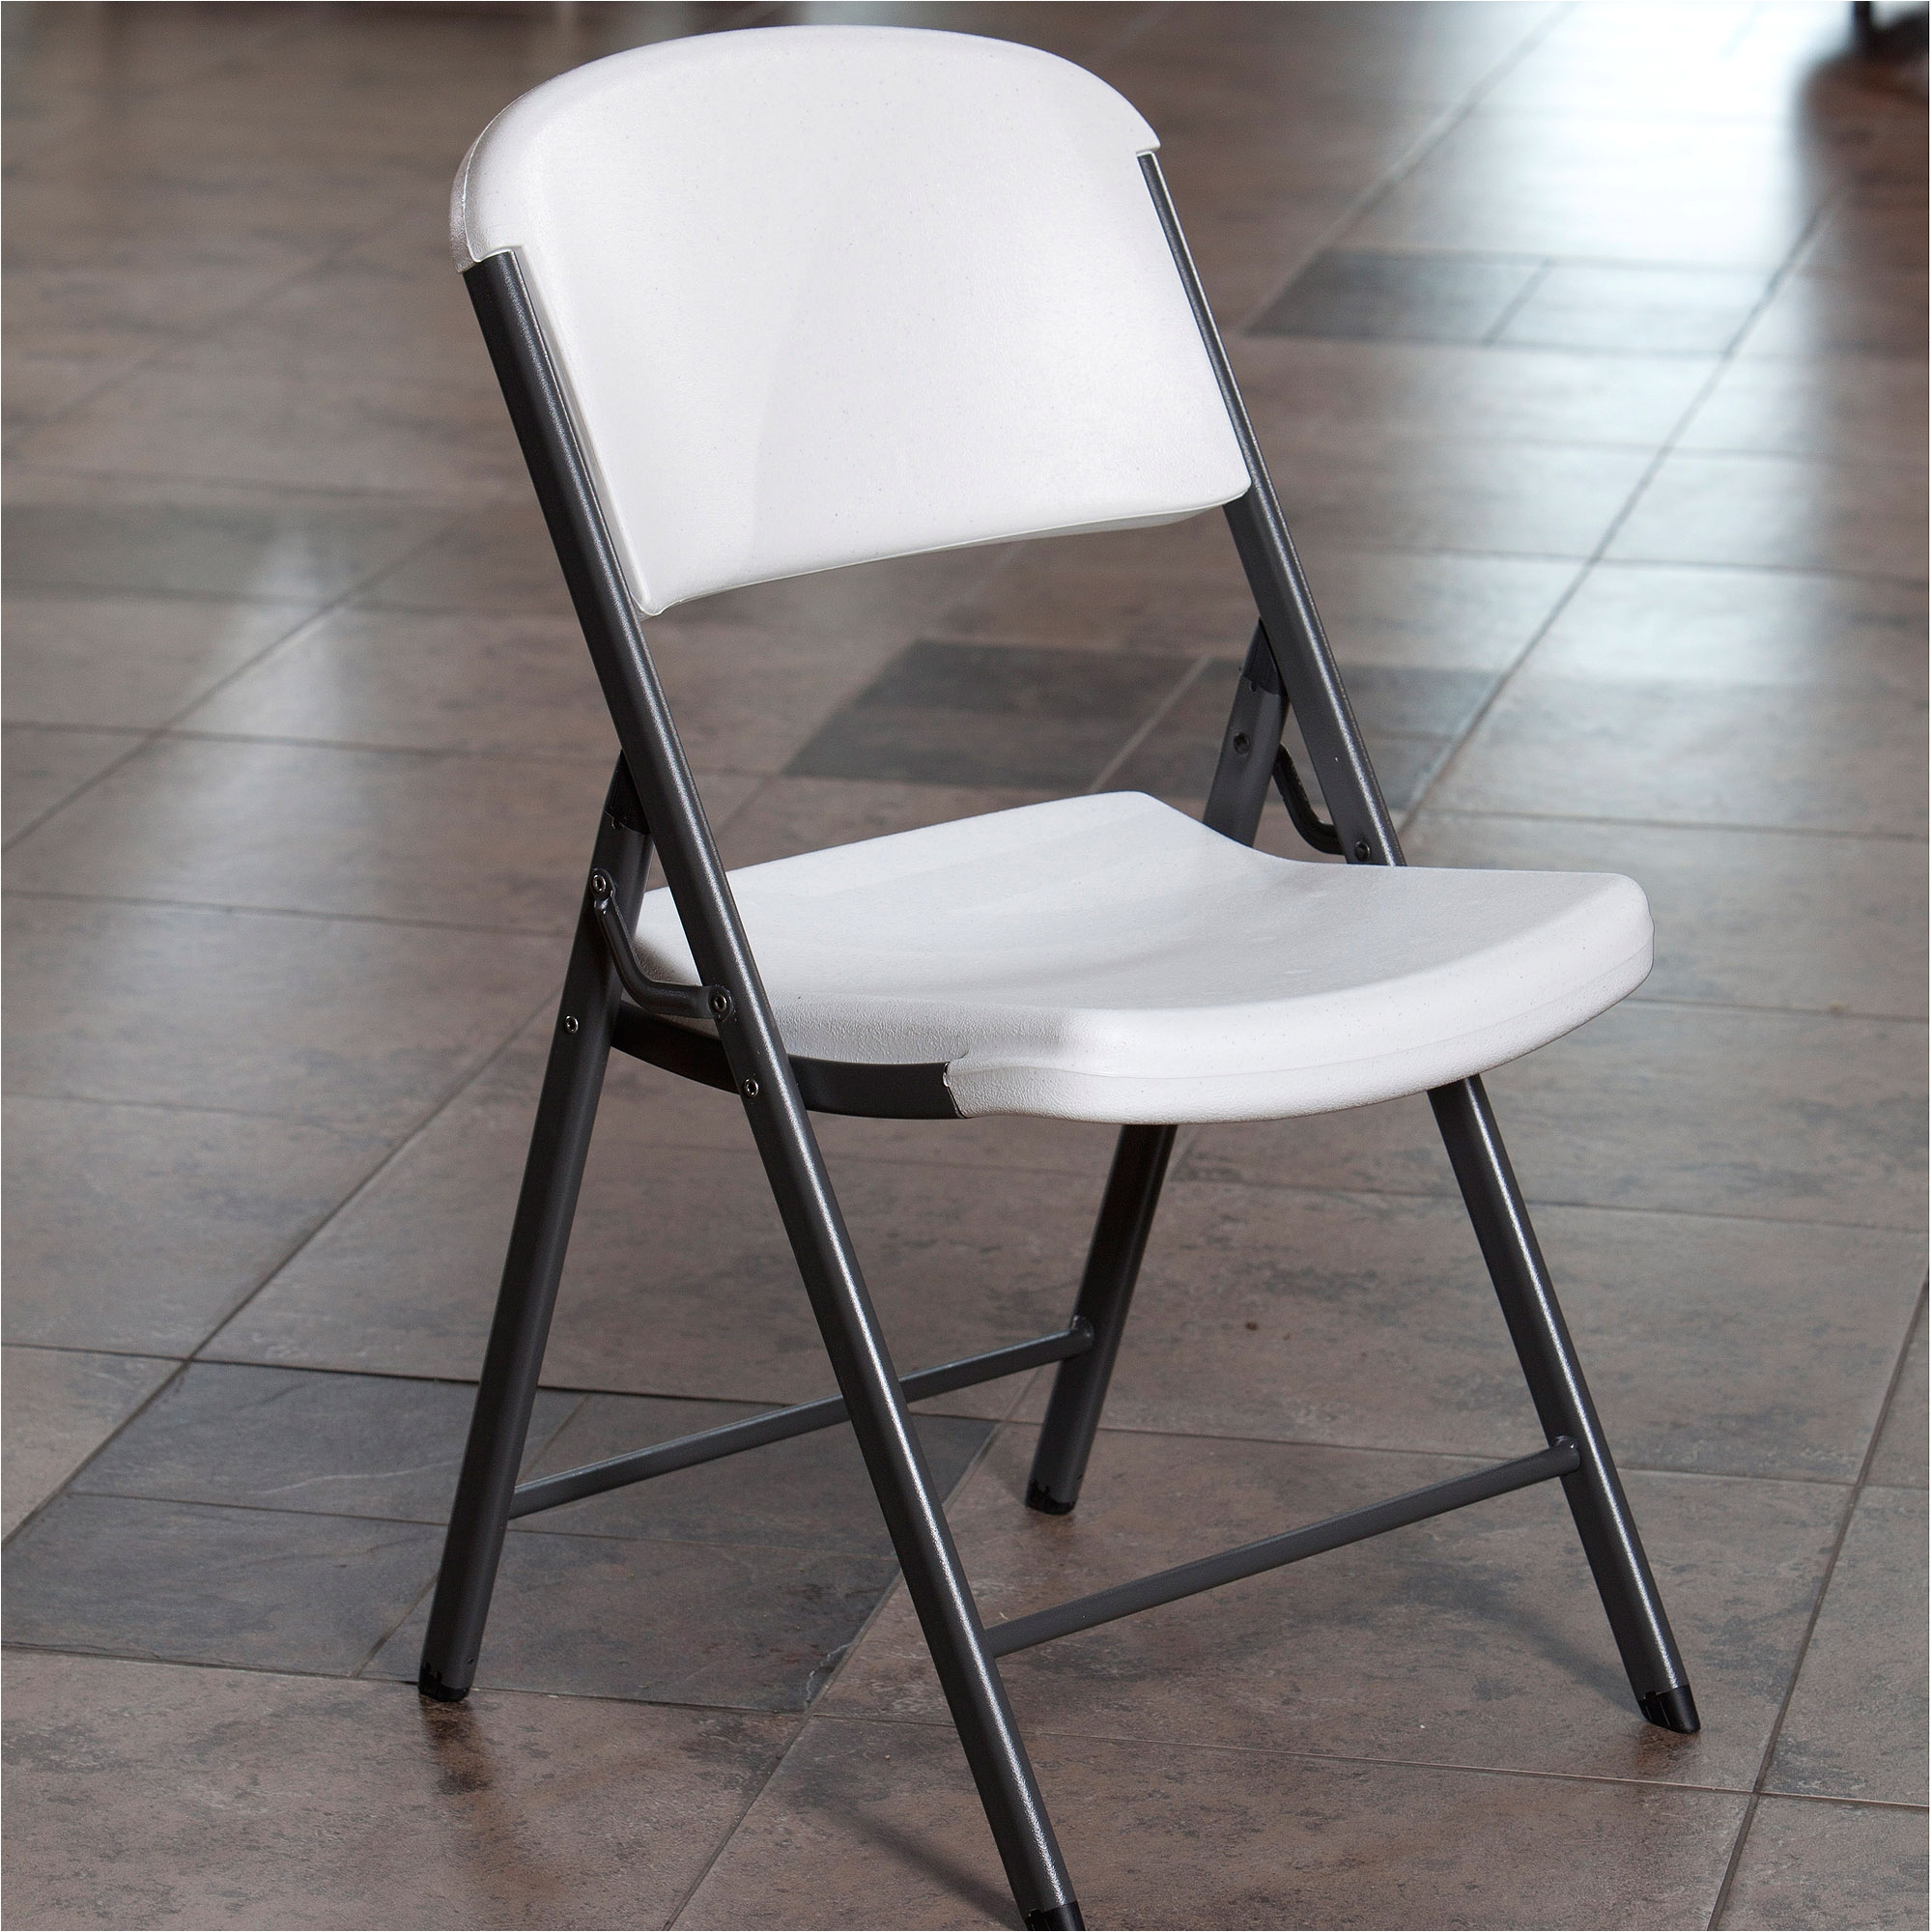 Lifetime Hard Plastic Chairs Chair Mid Century Modern Folding Chair Allan Gould at Chairs Teak